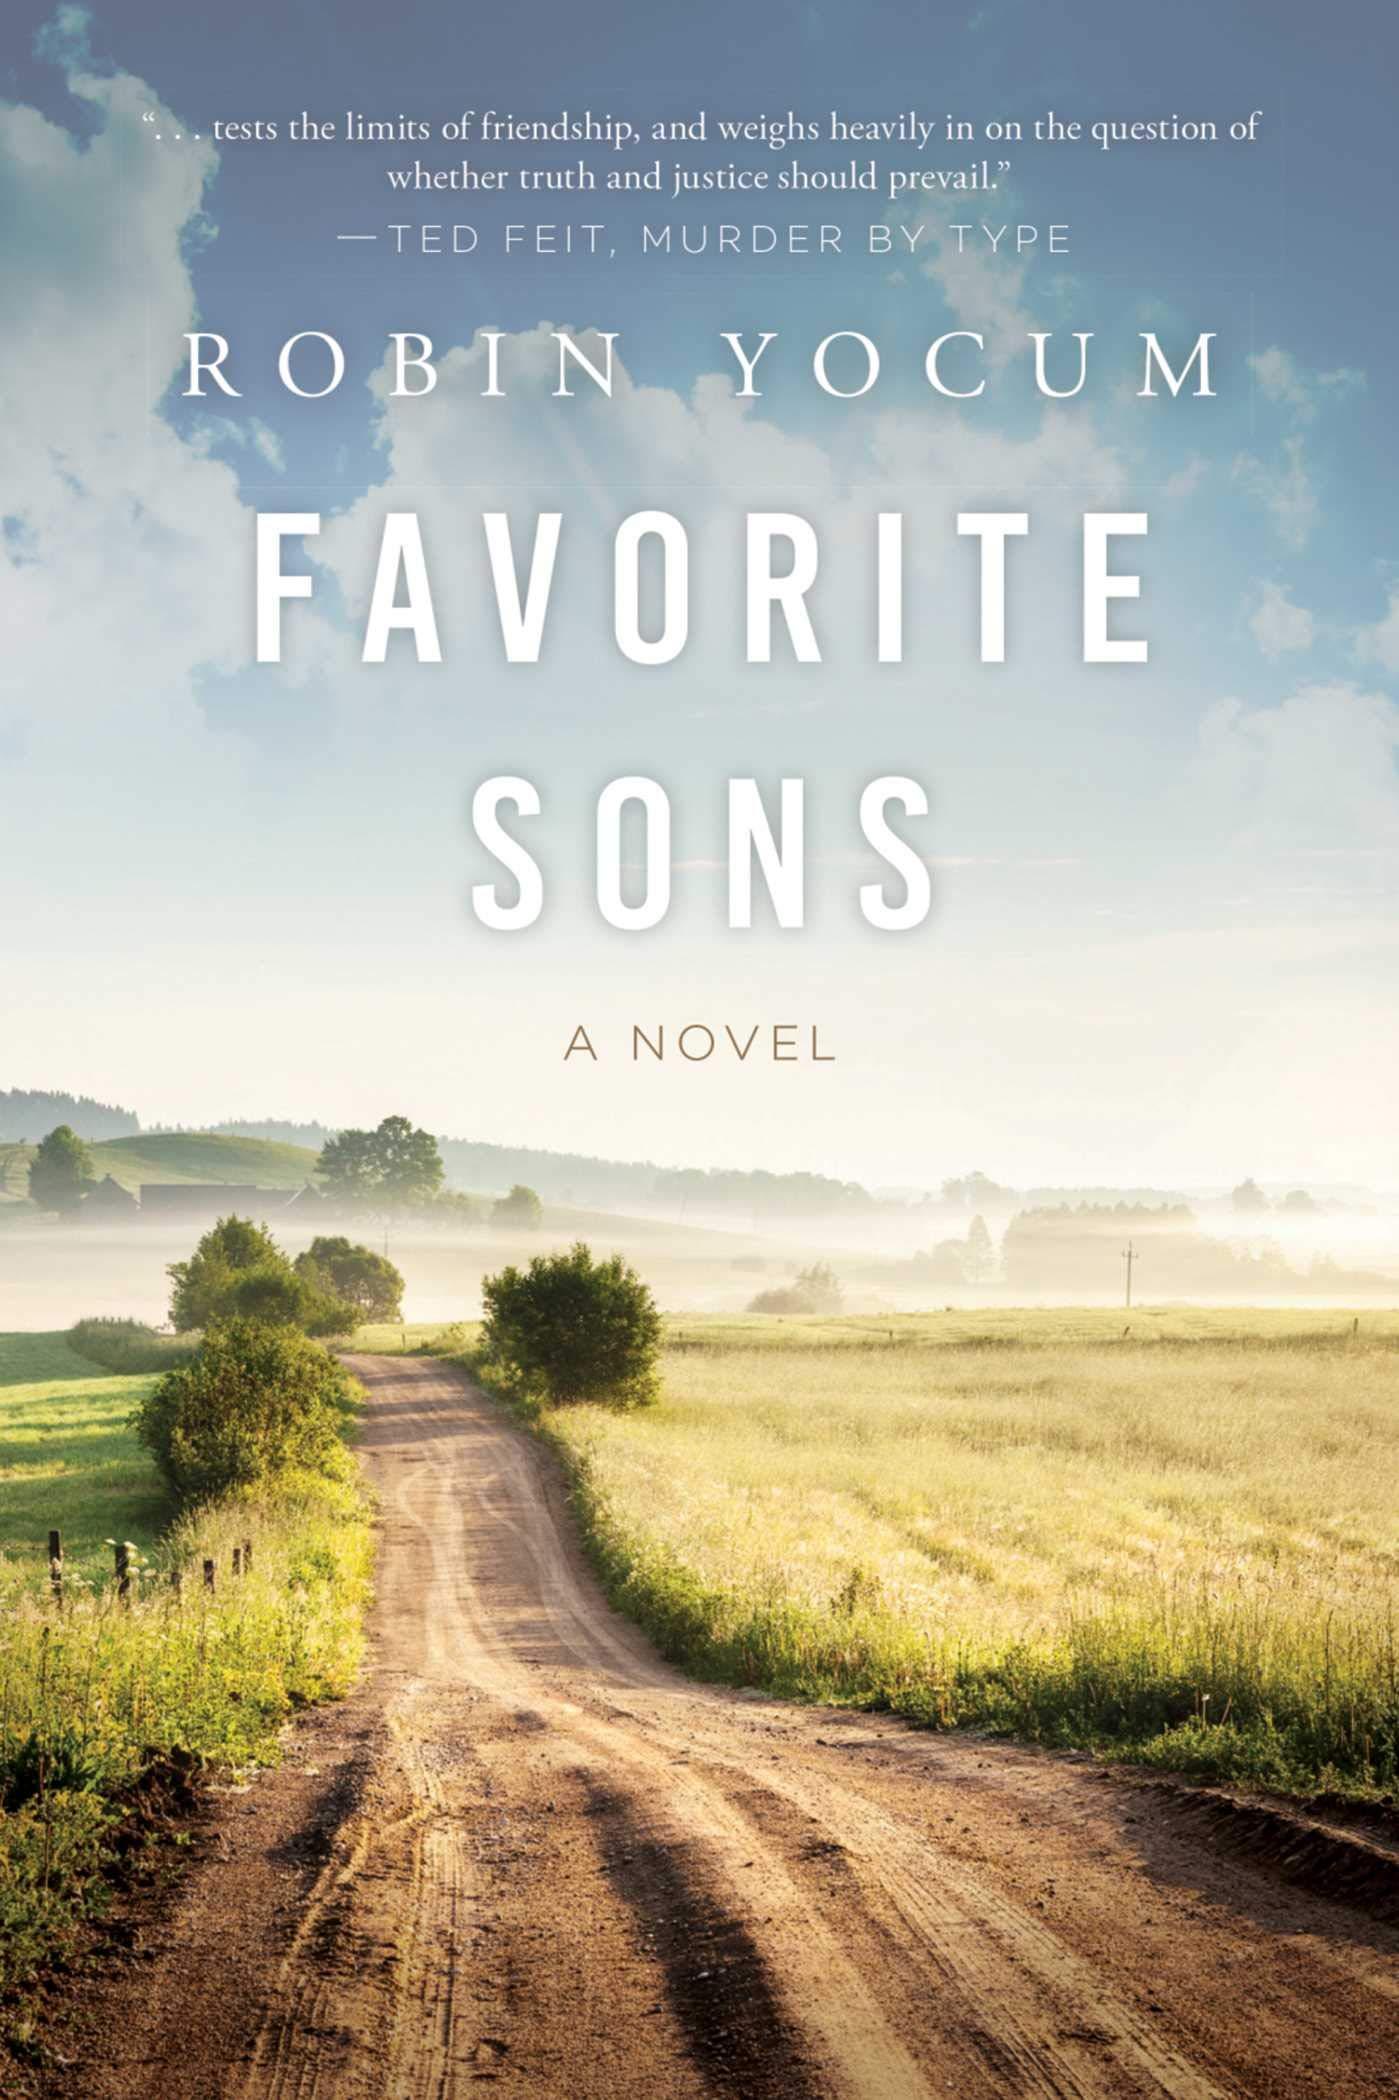 the essay robin yocum sparknotes